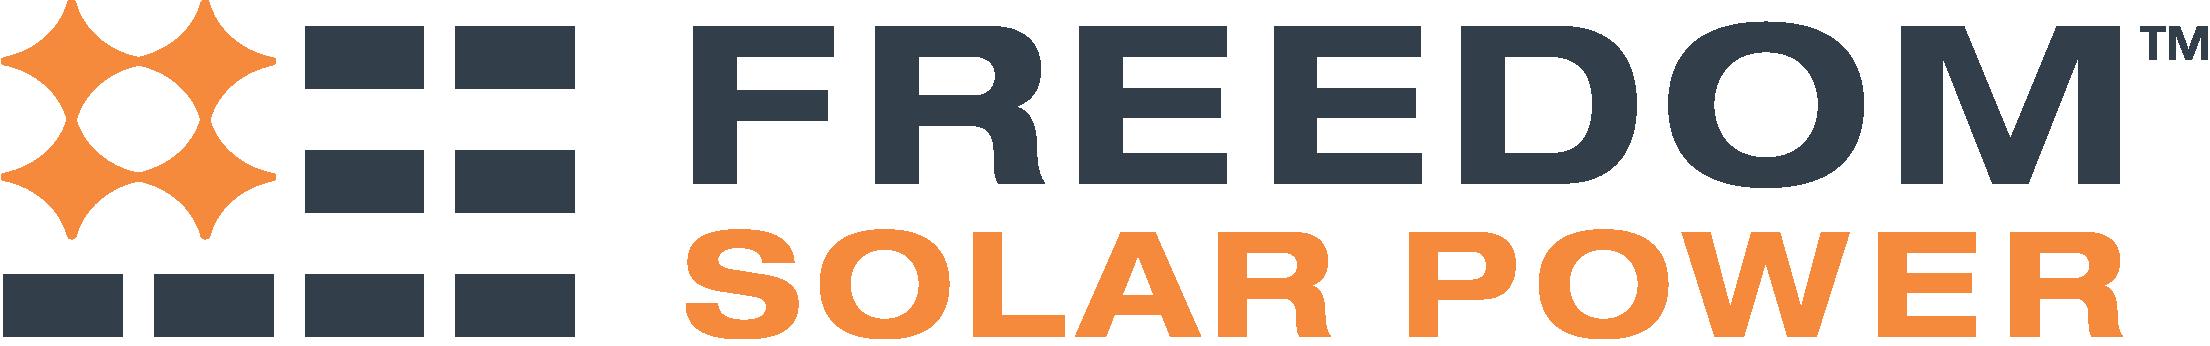 Freedom Solar Power logo